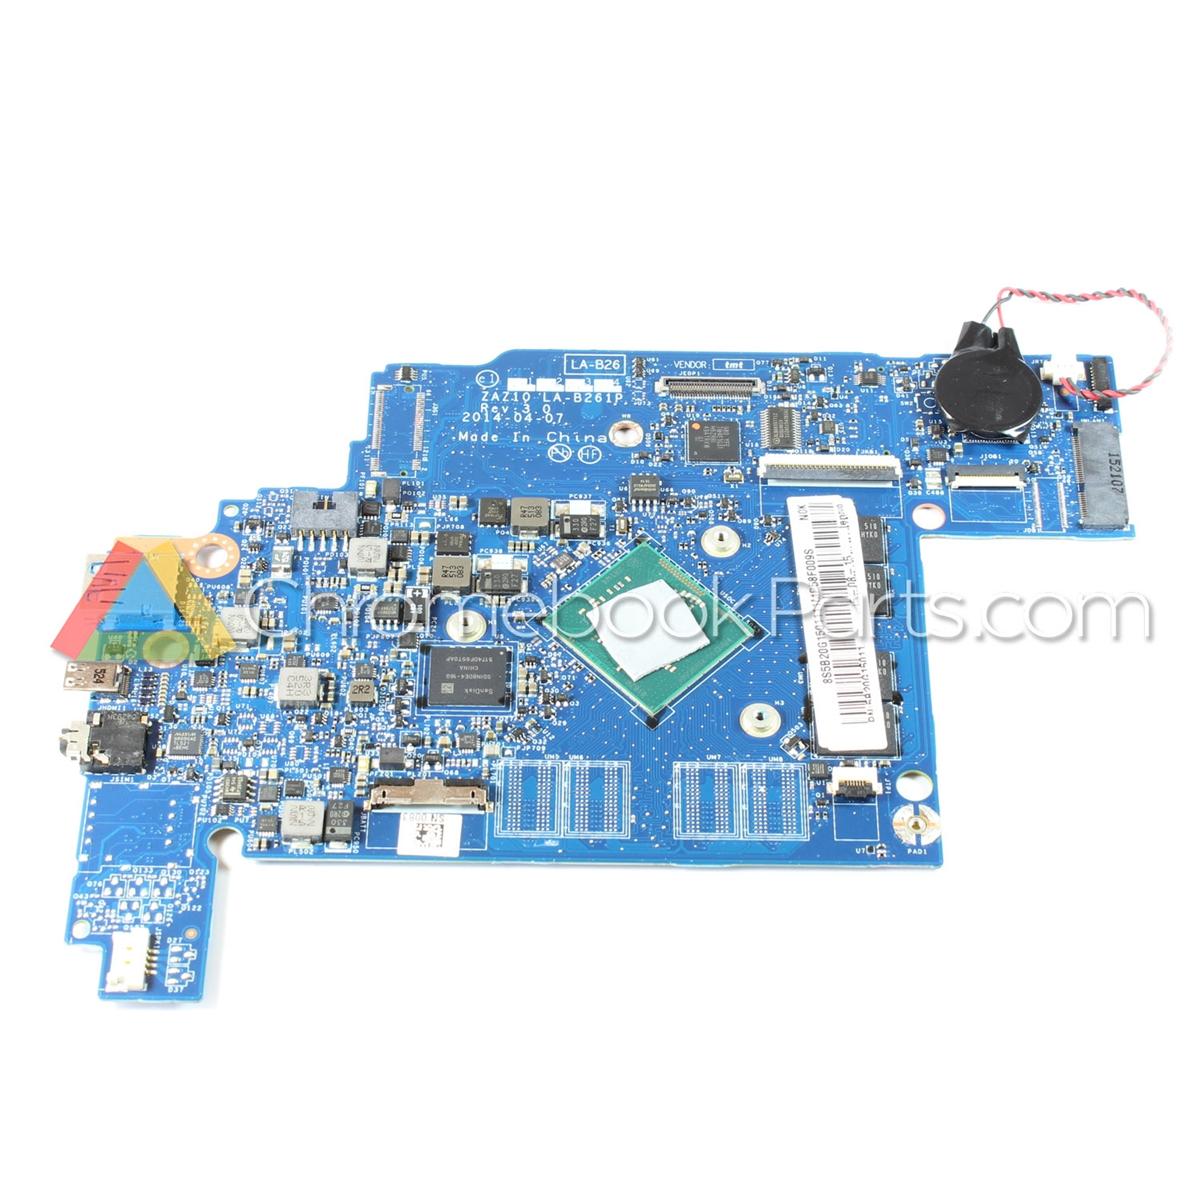 Lenovo 11 N20P Chromebook Motherboard, 2GB